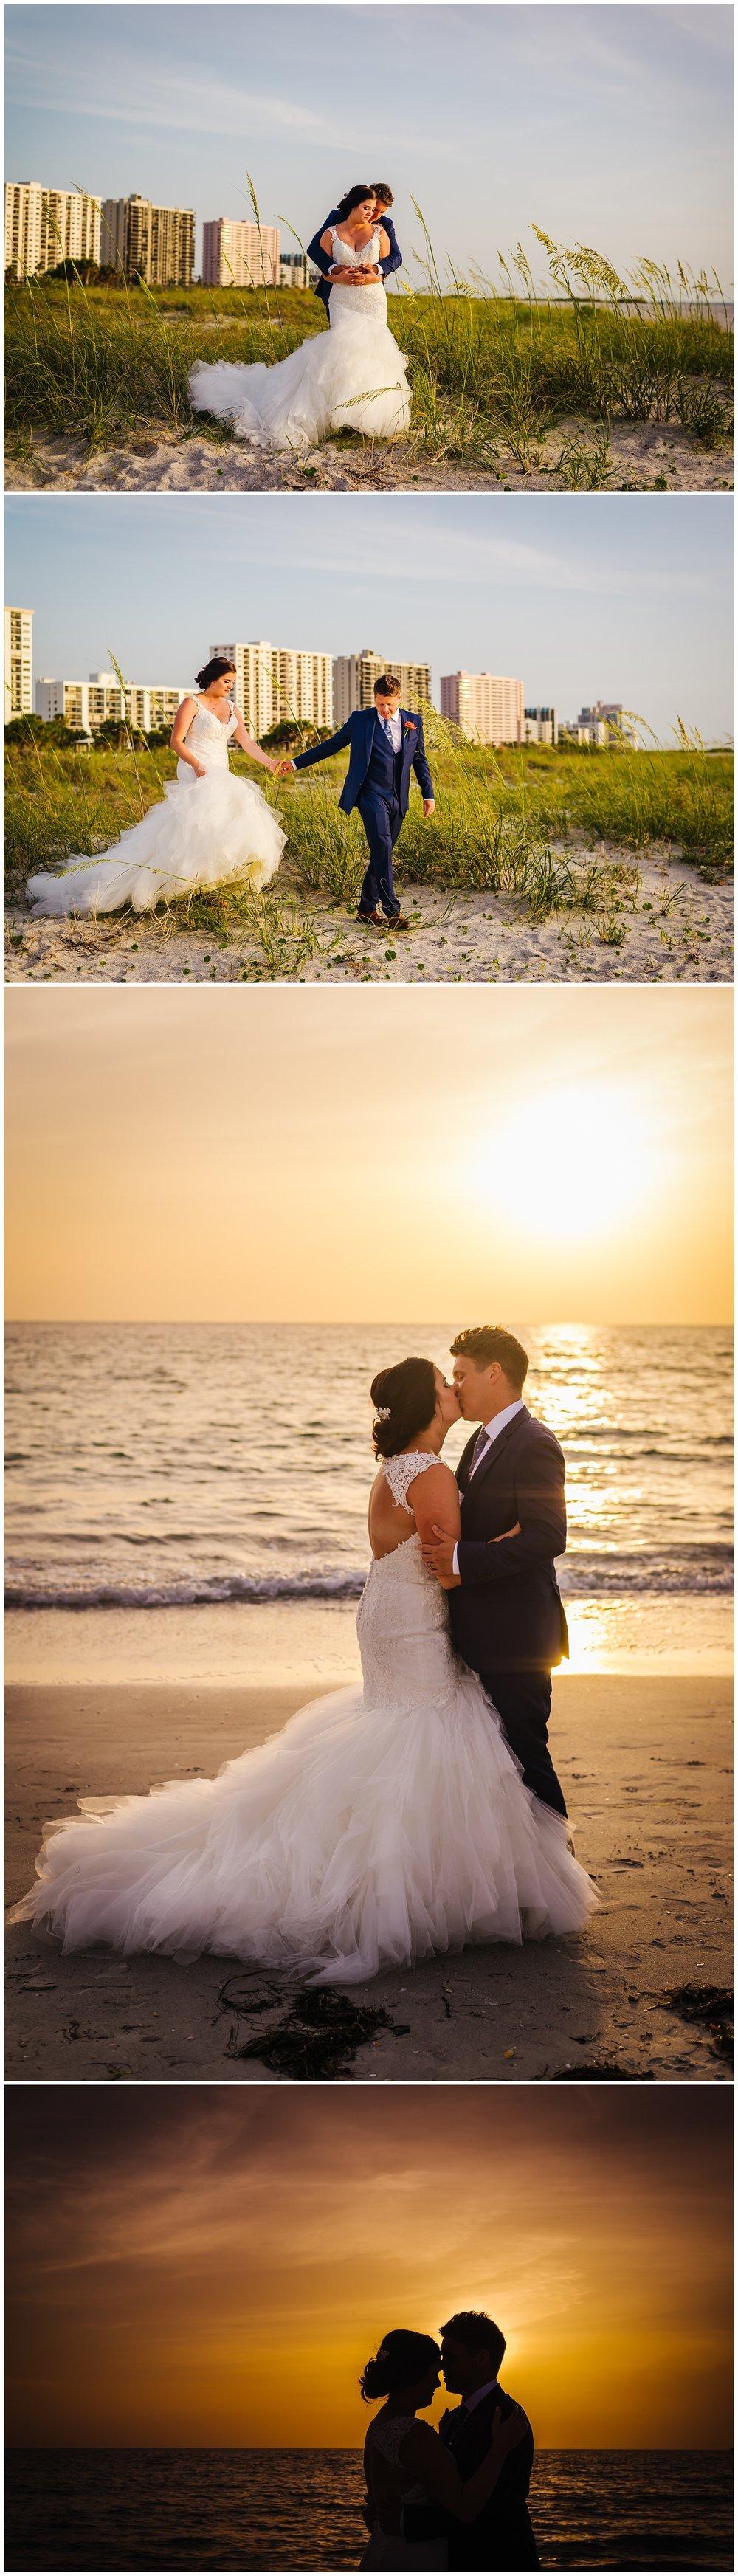 Clearwater-destination-wedding-photographer-jimmy-choo-yves-st-laurent-sunset_0102.jpg